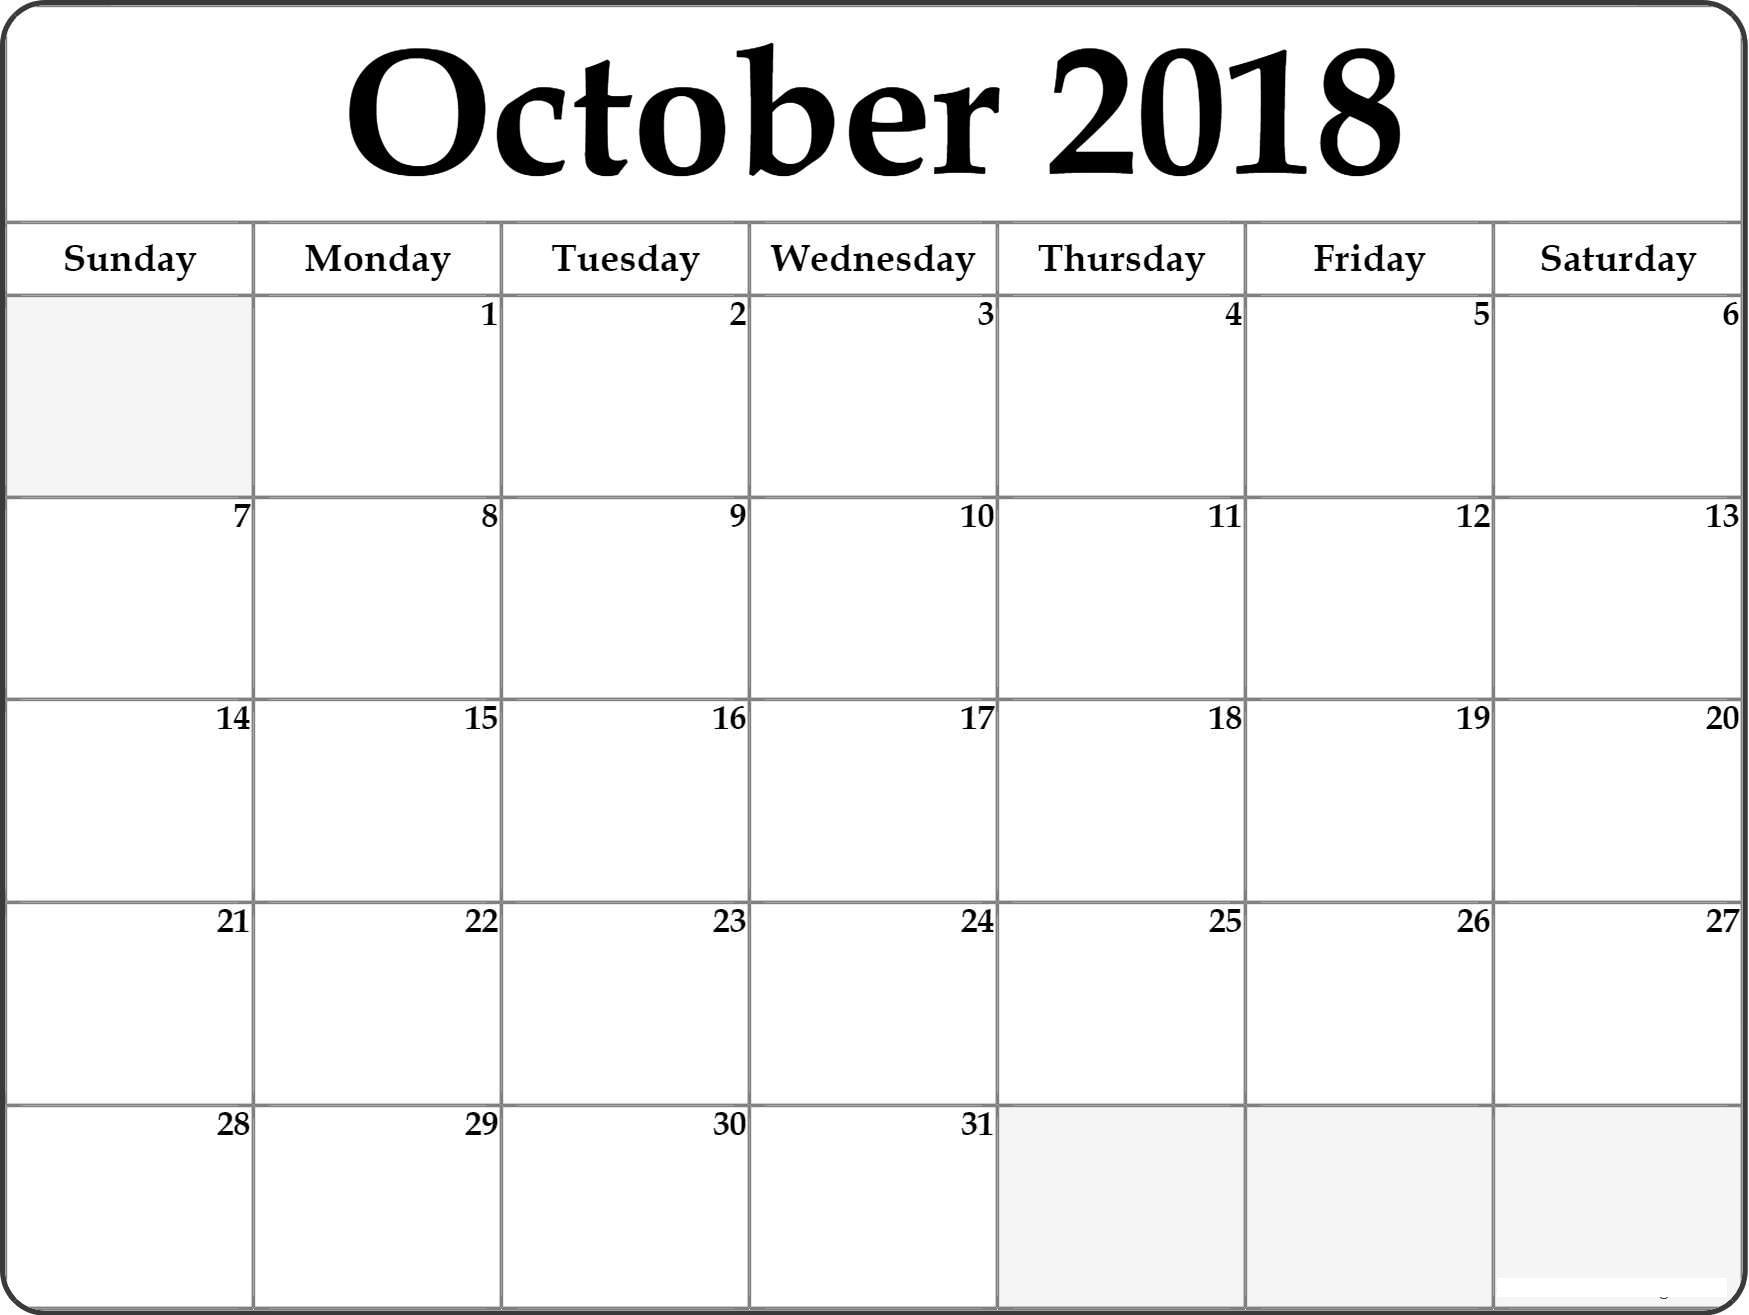 October-2018-calendar-b4